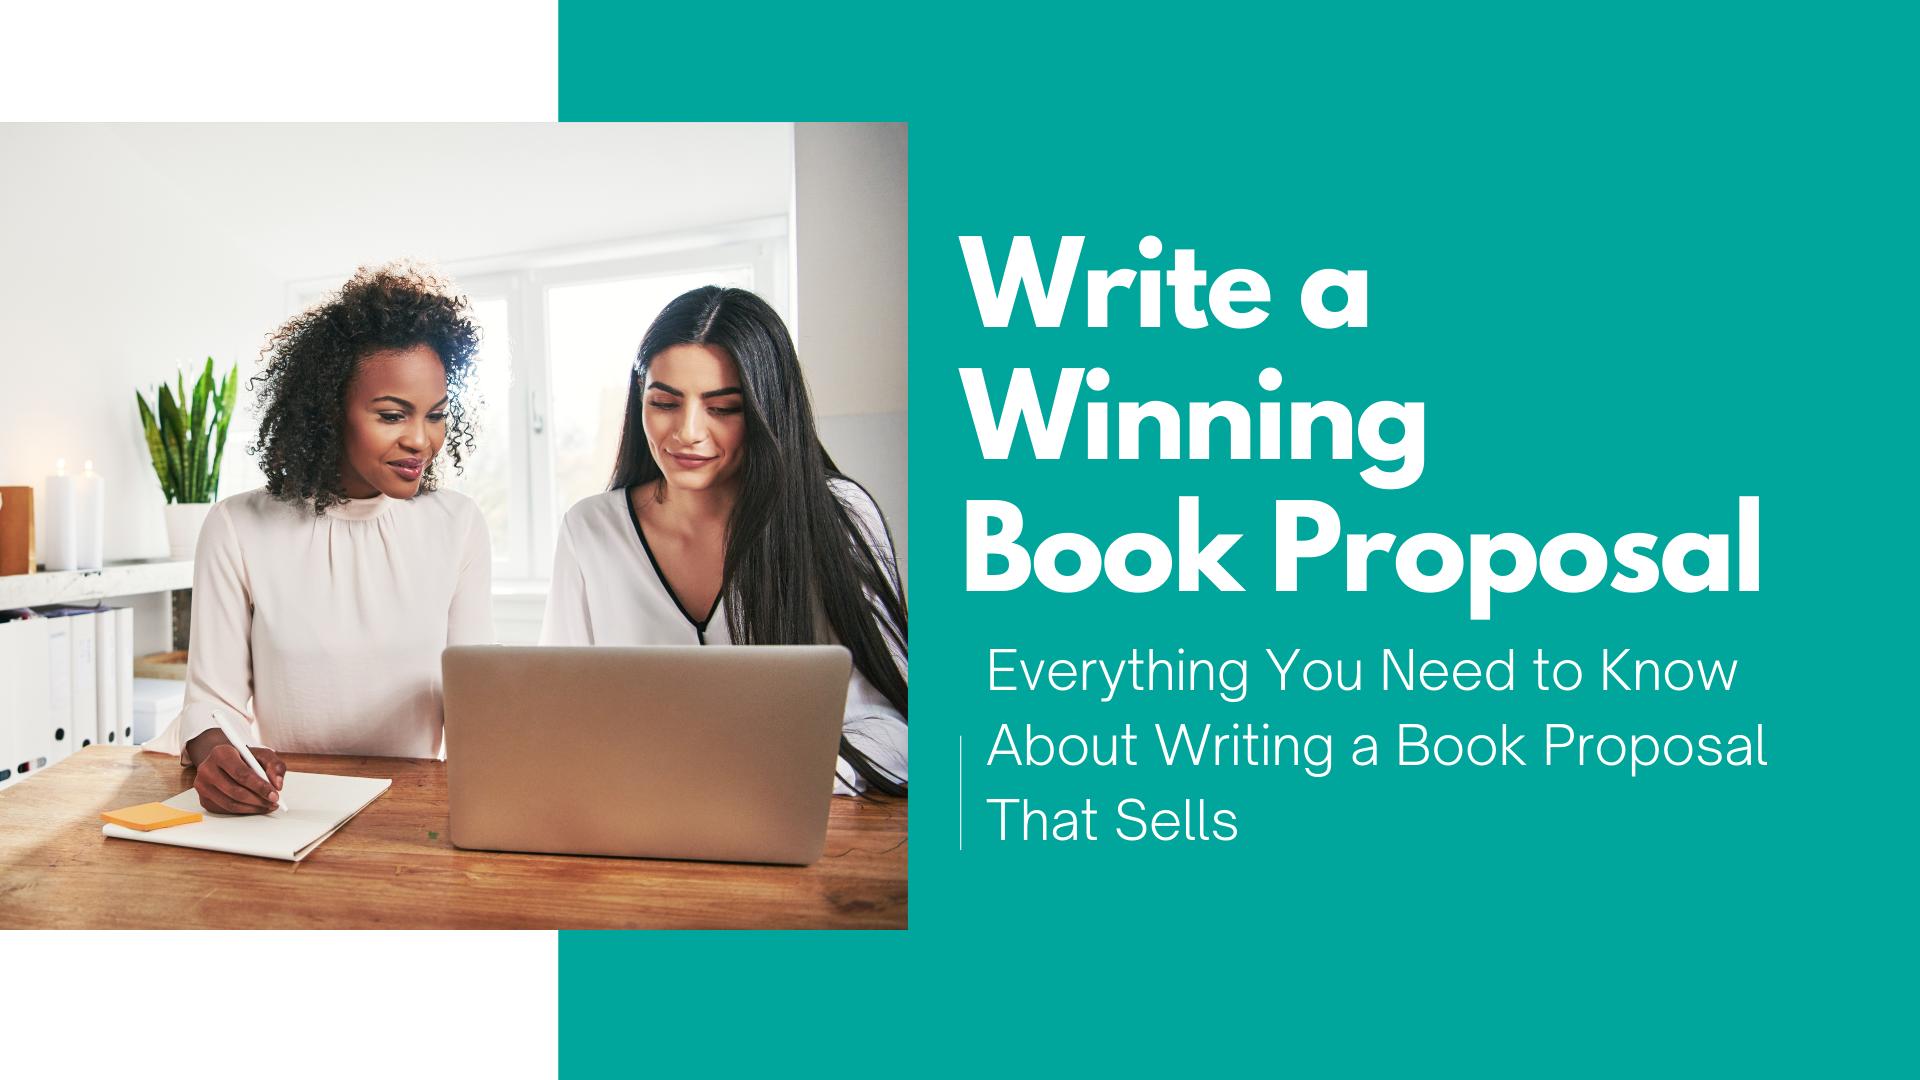 Create a Winning Book Proposal